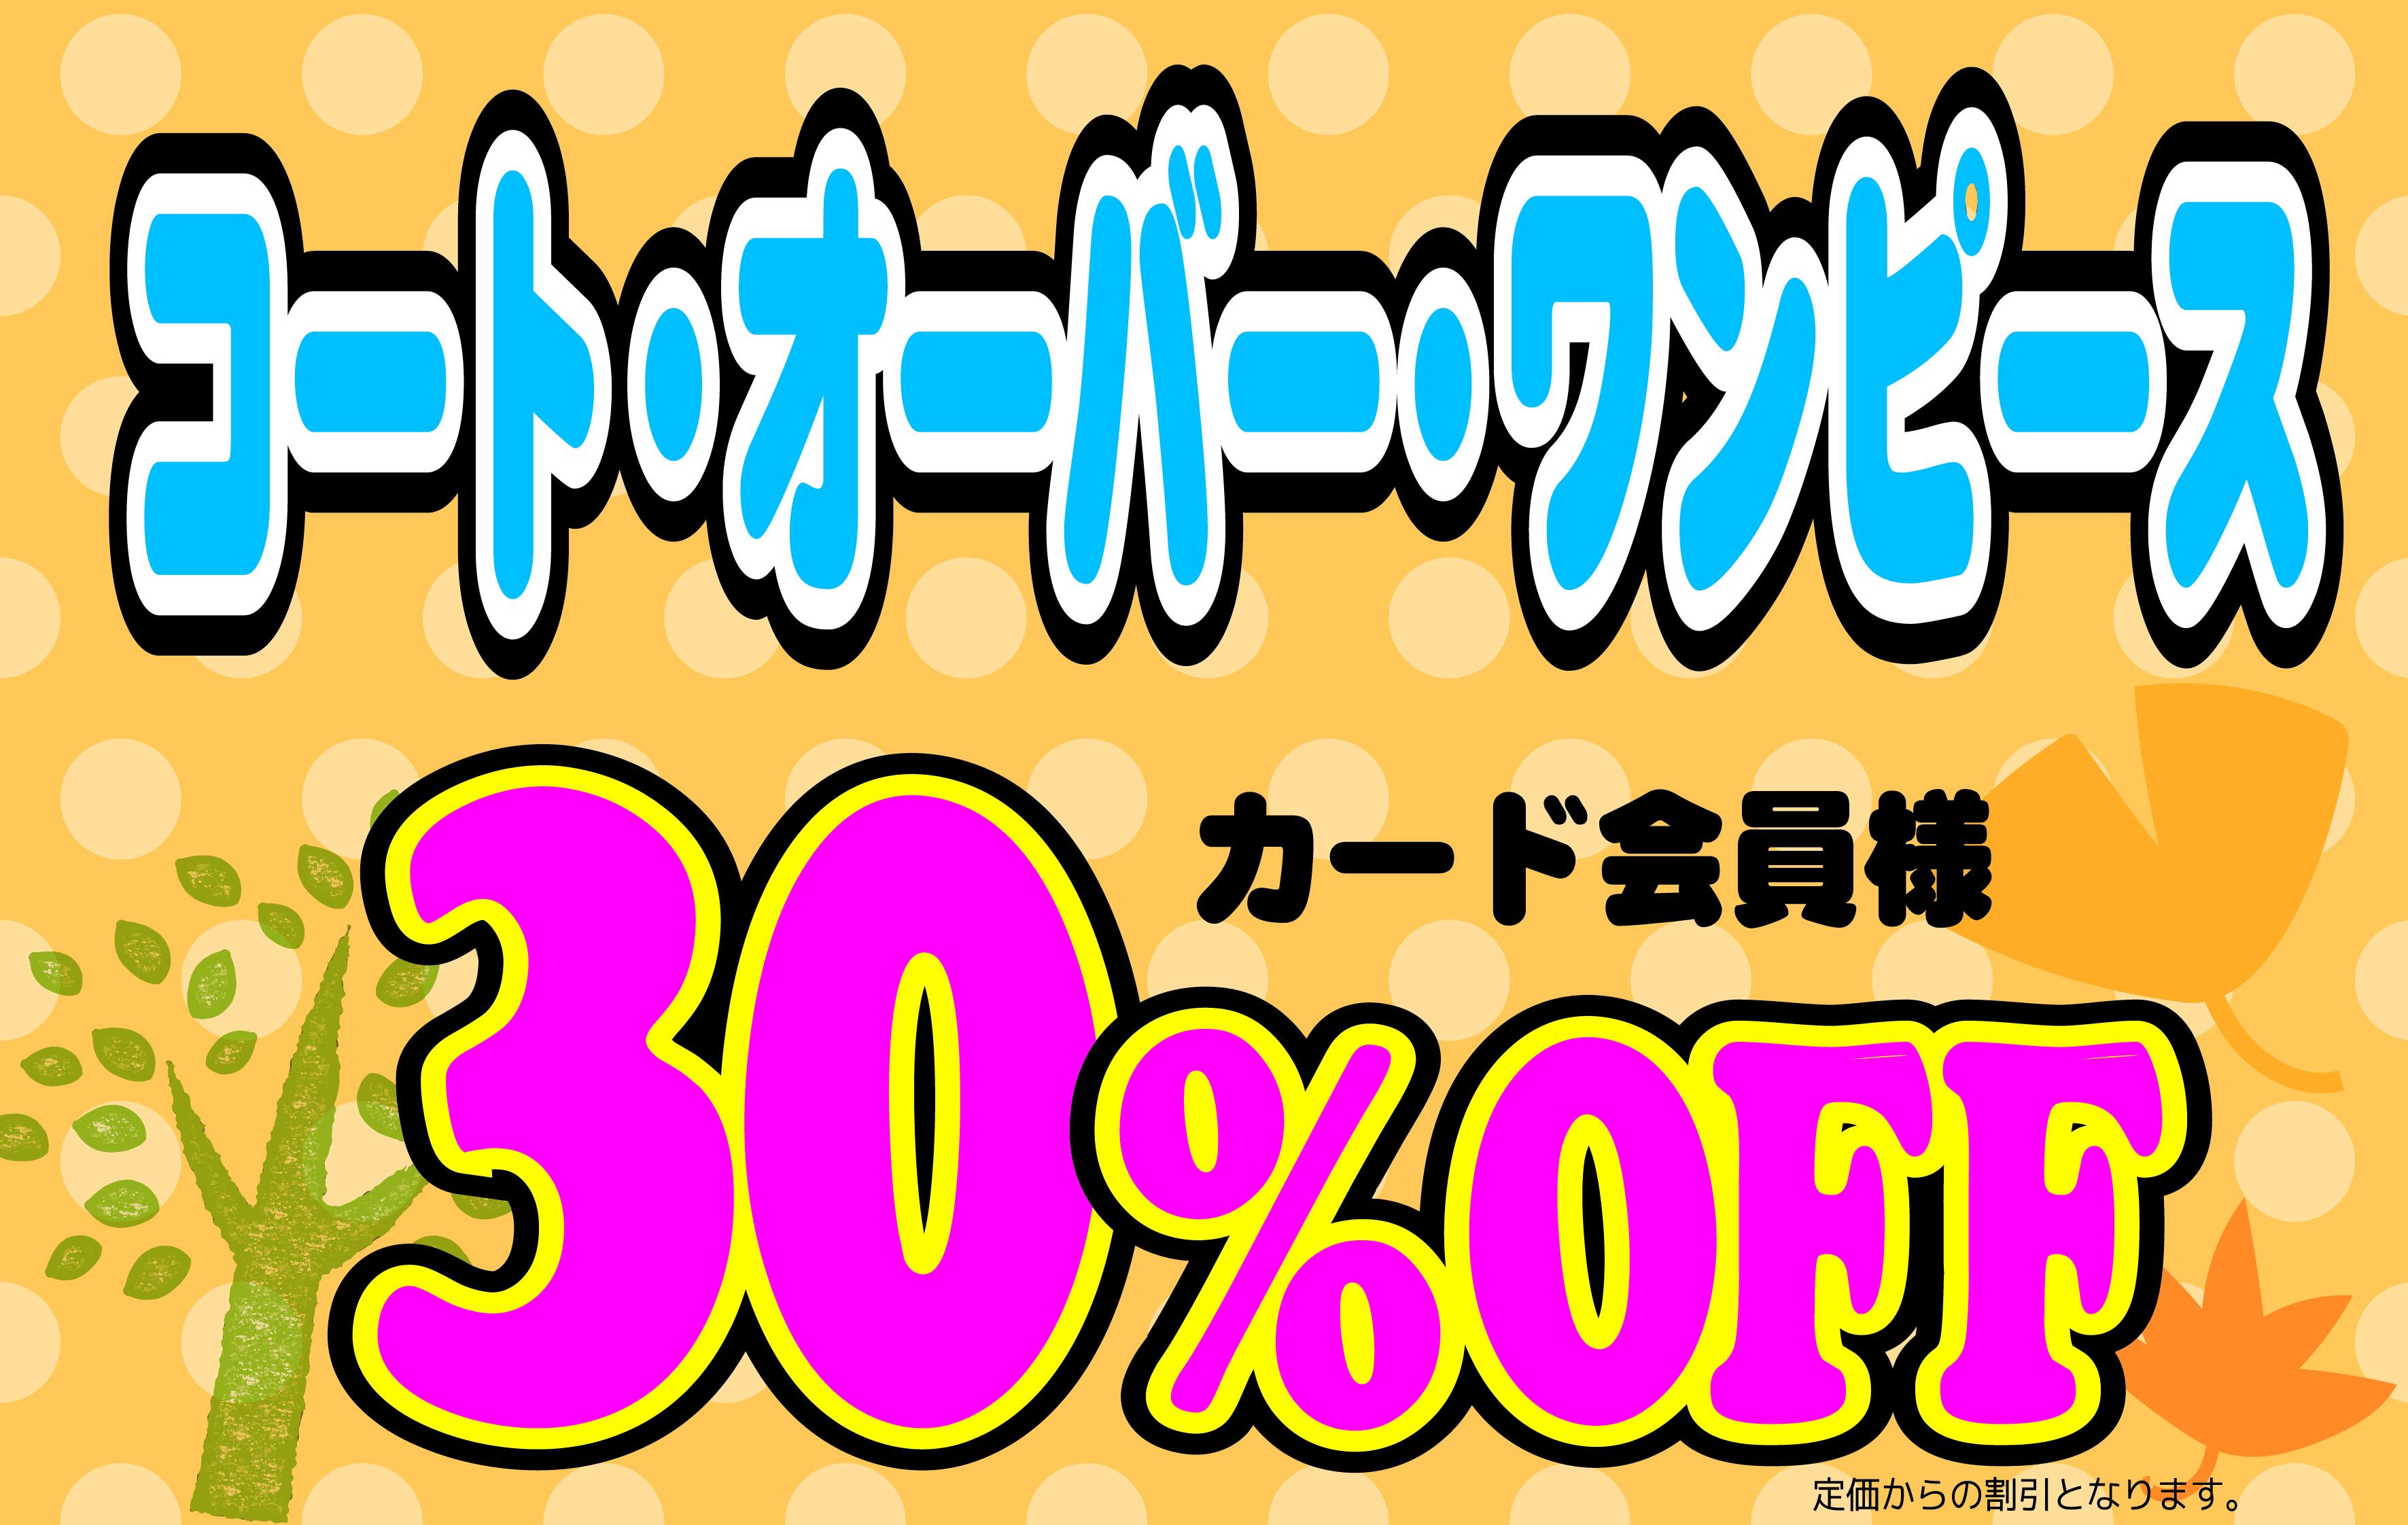 web_30%